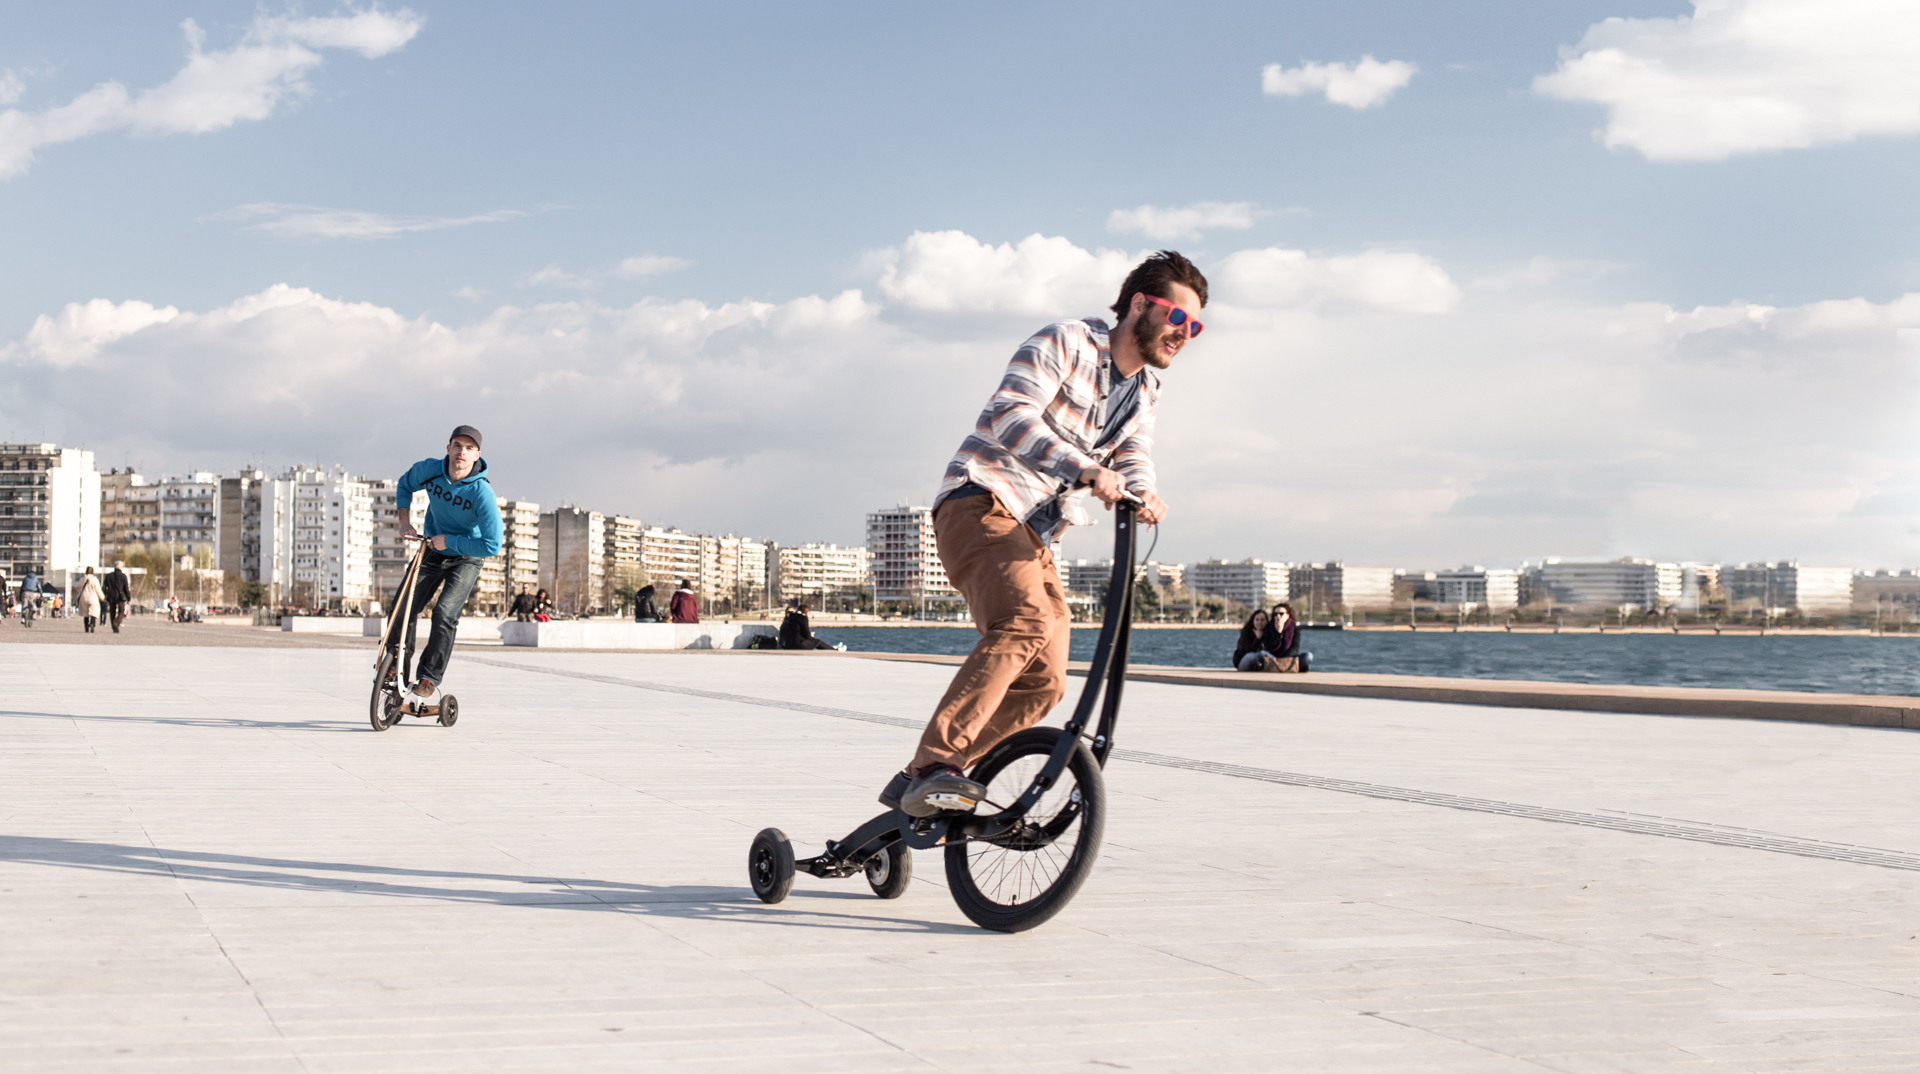 halfbike - daily cappuccino - lifestyle blog